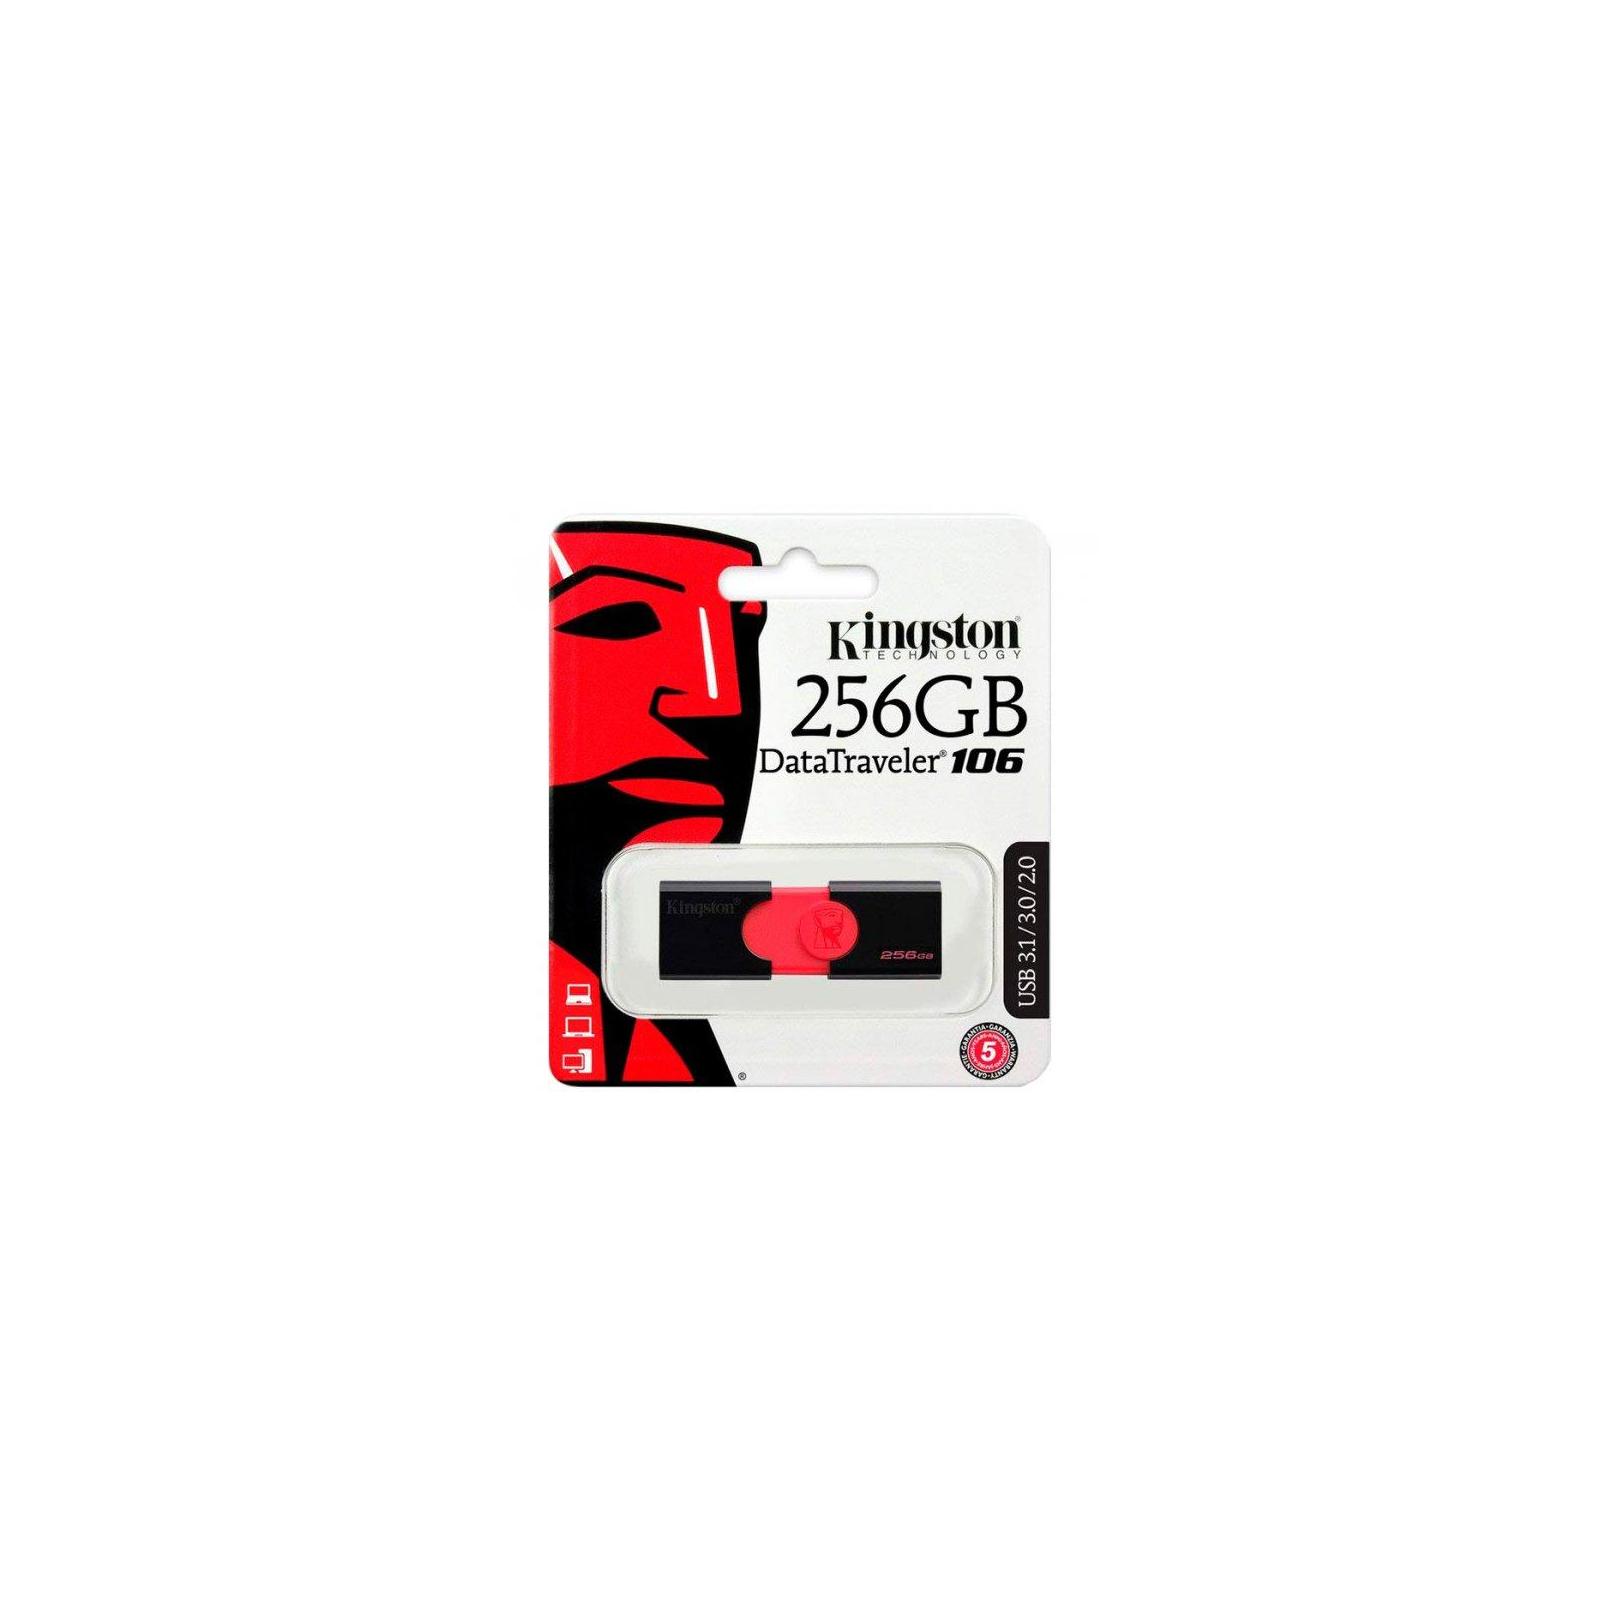 USB флеш накопитель Kingston 256GB DT106 USB 3.0 (DT106/256GB) изображение 5